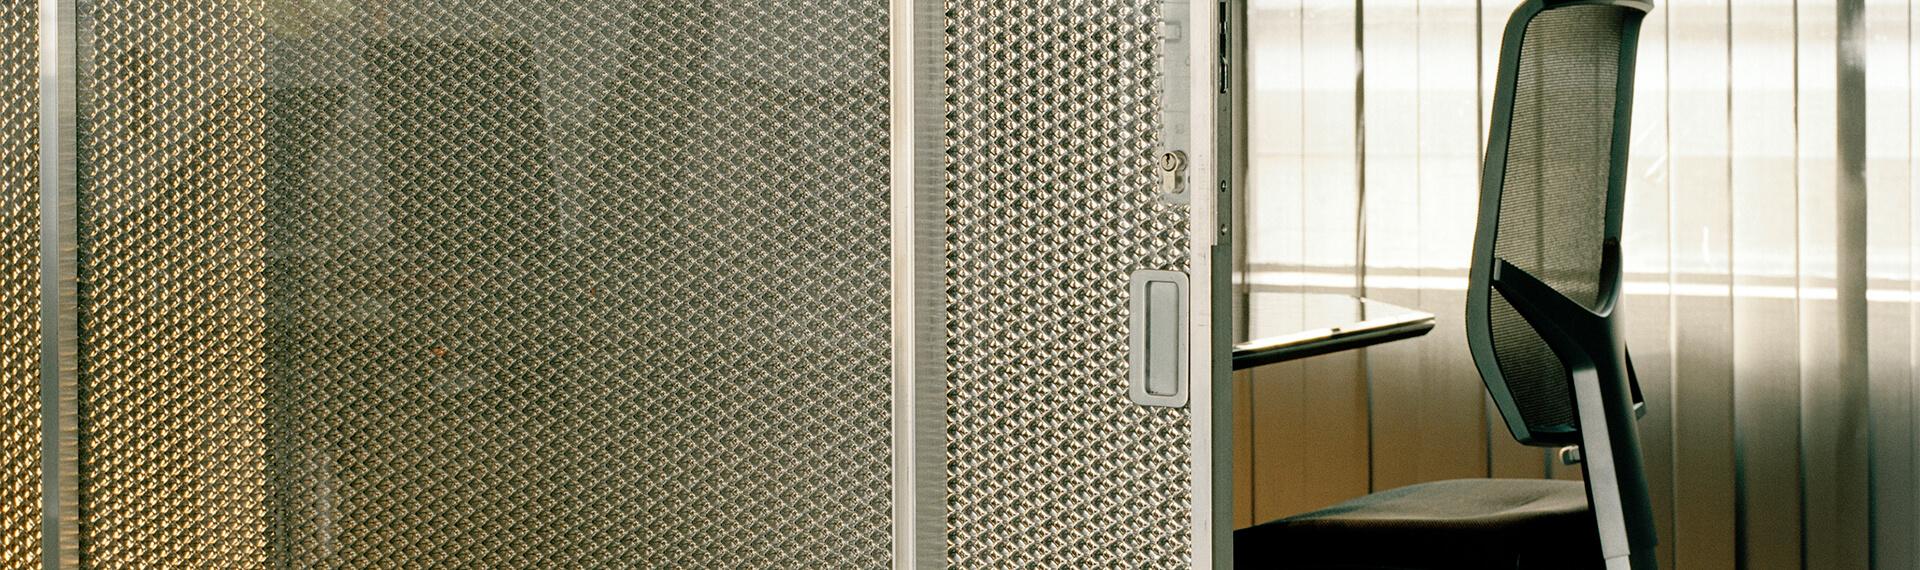 Aluminium Composite Decorative Panels - Mykon cells